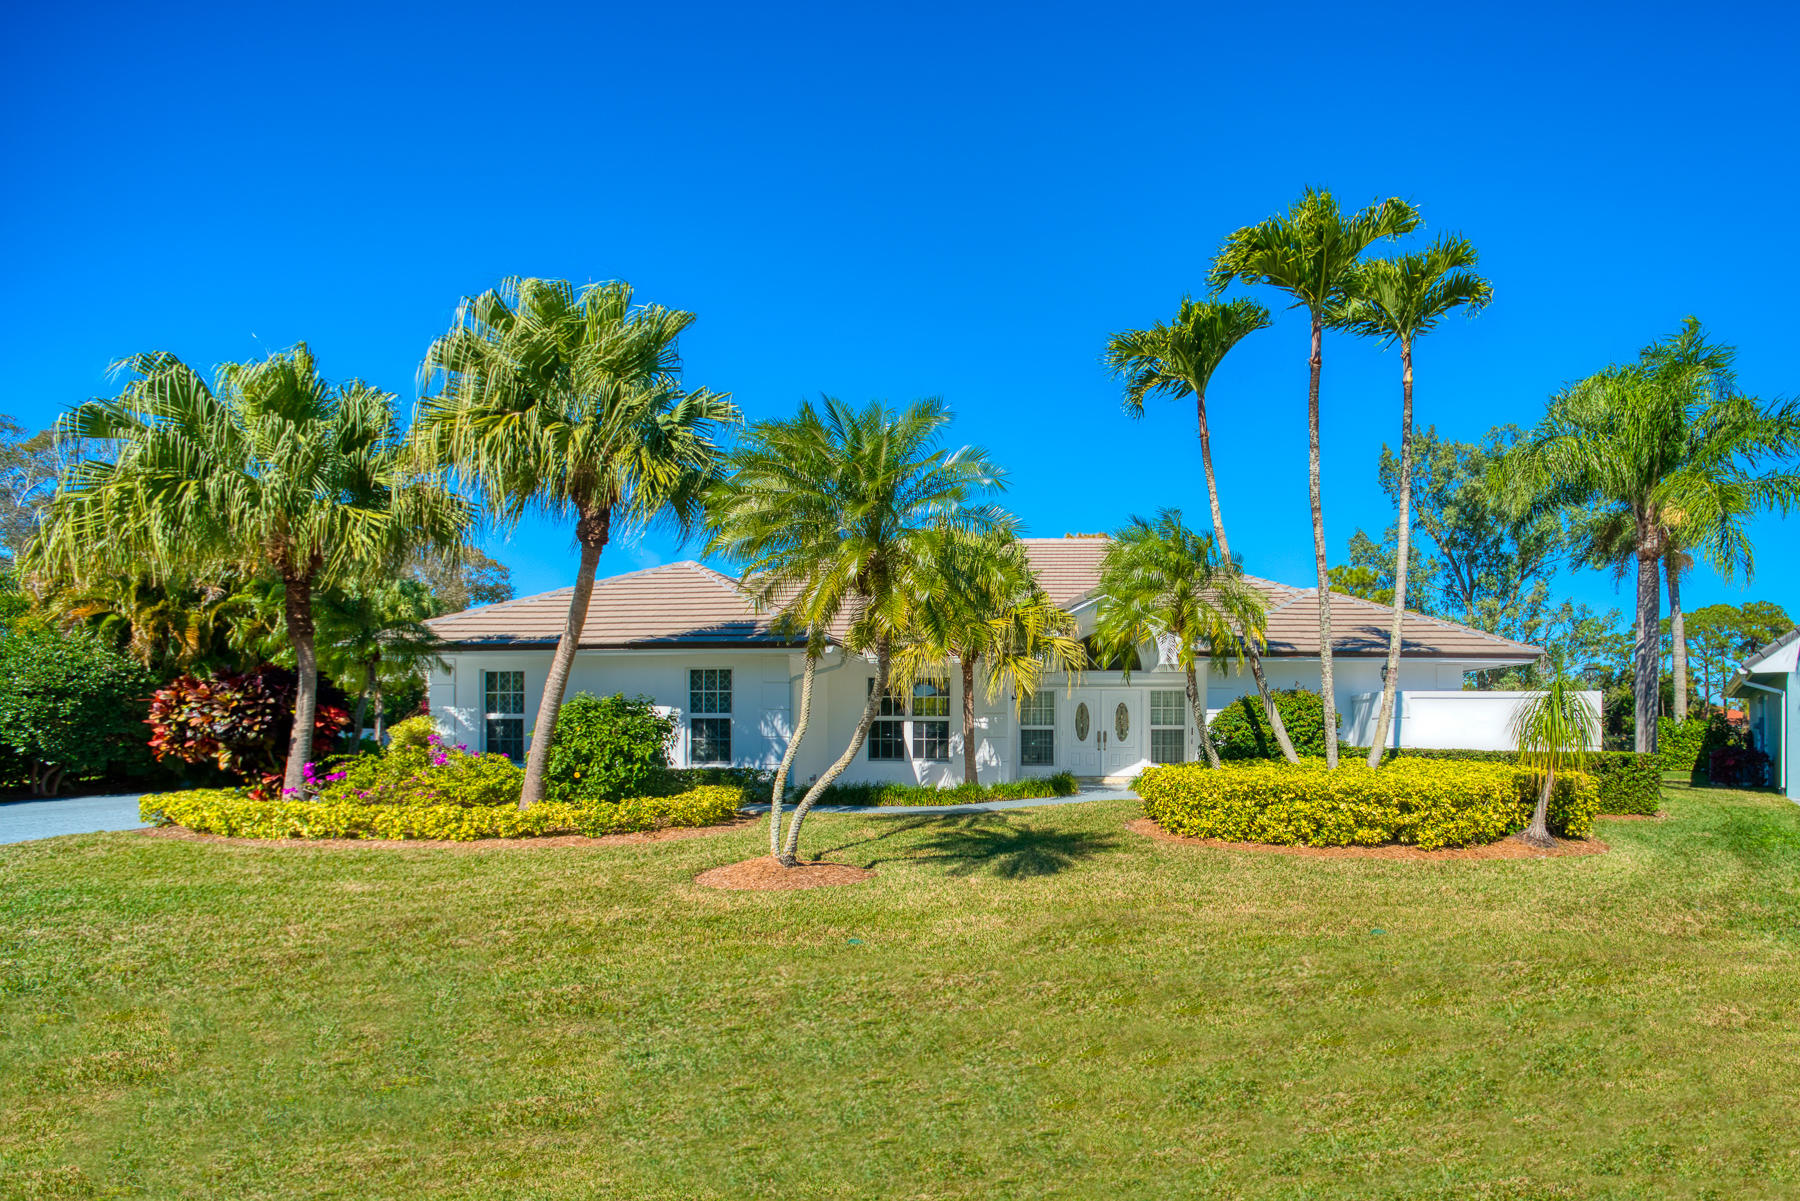 Photo of 5 Guillard Court, Palm Beach Gardens, FL 33418